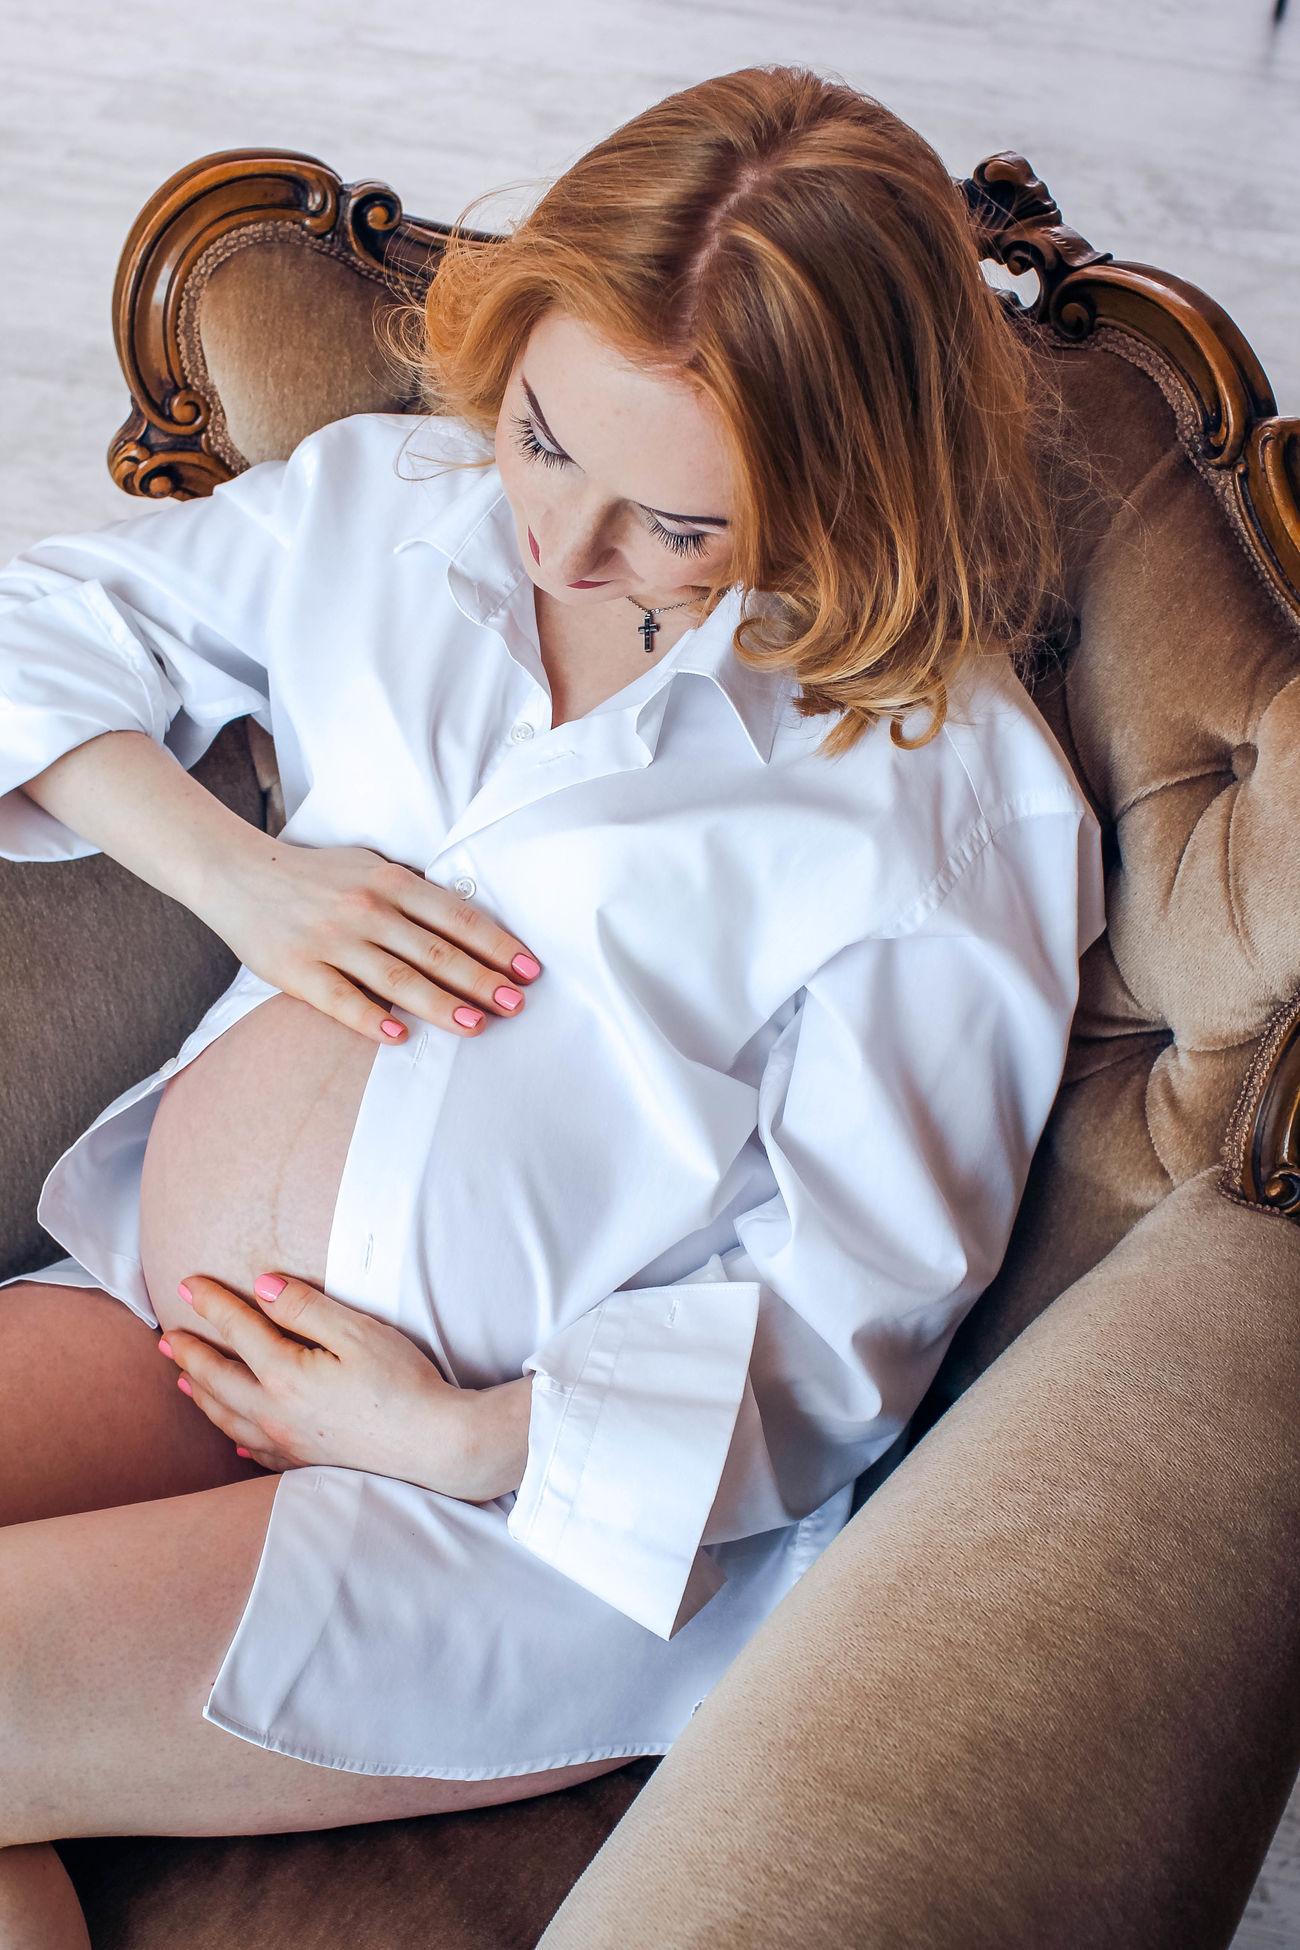 Азов 161 Россия фото Nikon Nikon D3200 Mama JReshetnyаk JuliaVidyapina Photographer Angel фотомодель Nikonphotographer